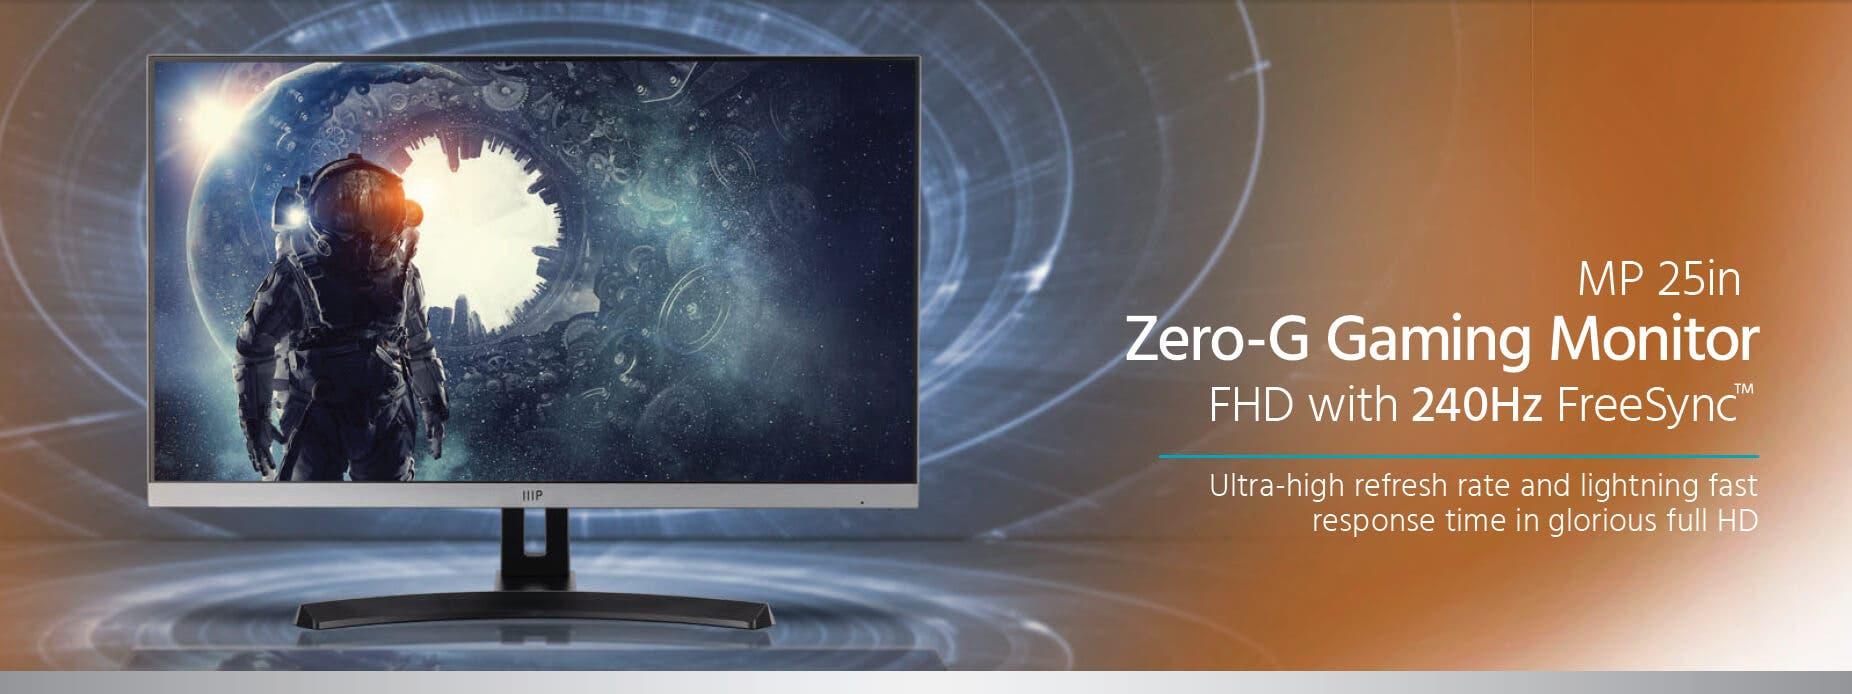 Monoprice MP 25in Zero-G Gaming Monitor – FHD, 240Hz, 1ms, FreeSync